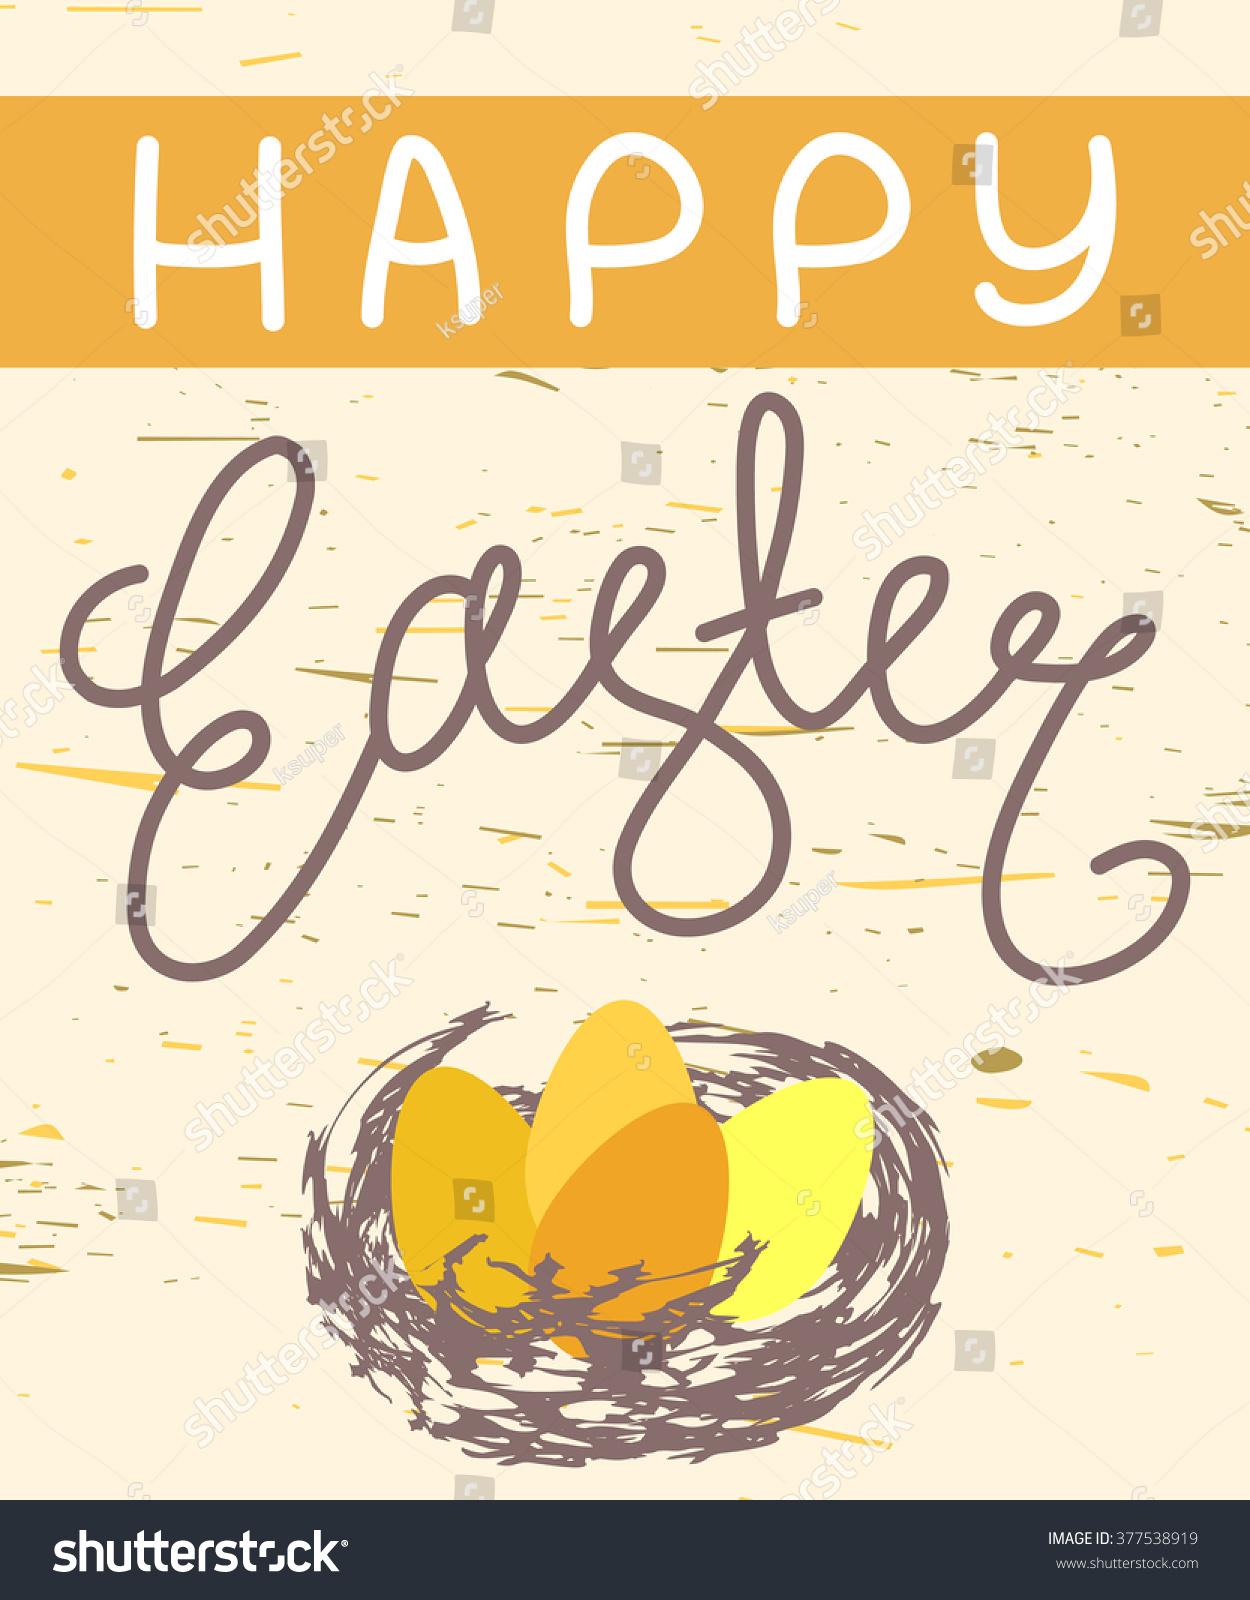 Happy Easter Greeting Card Handwritten Trendy Stock Vector 2018